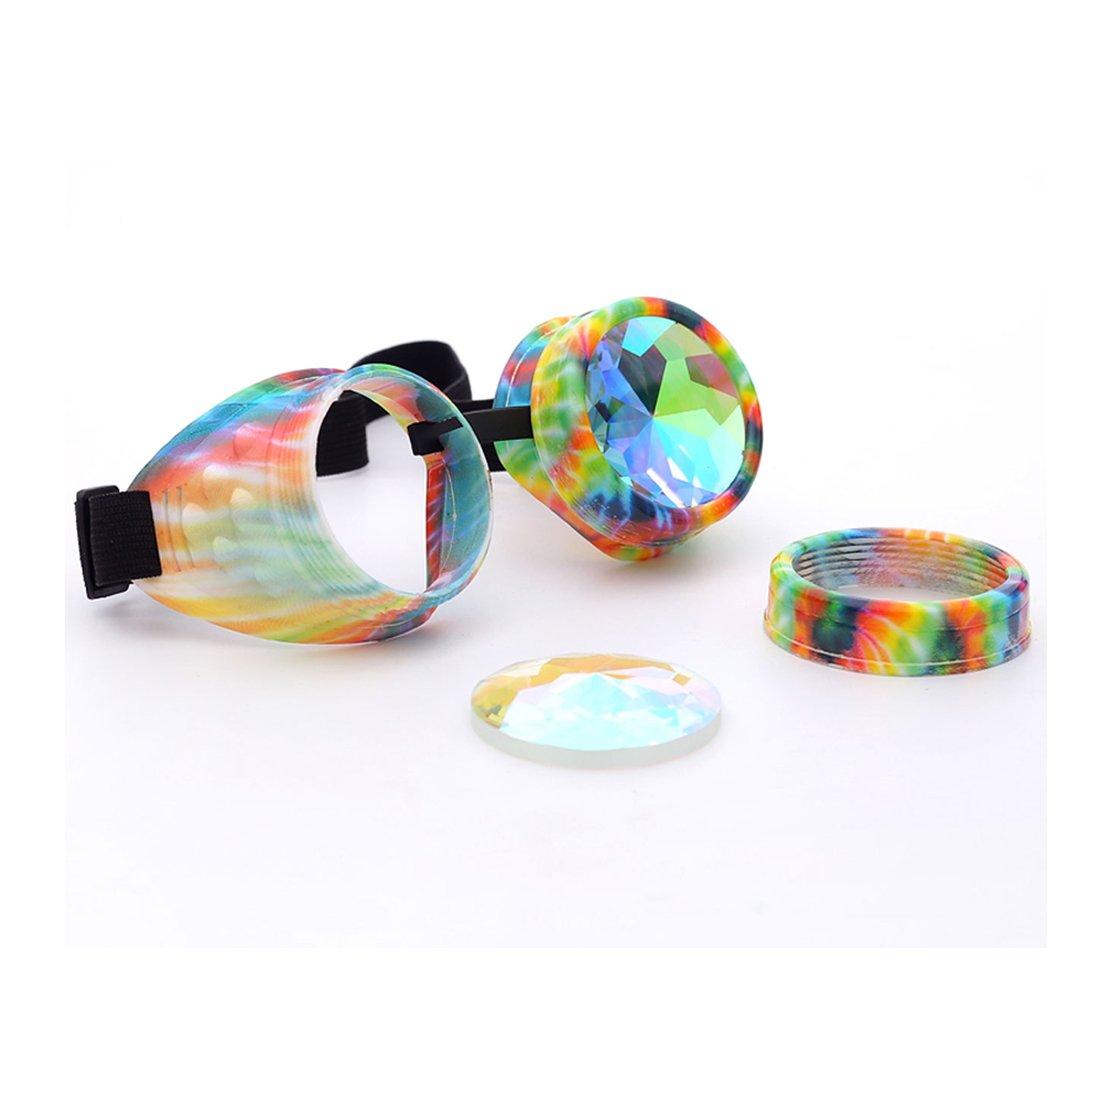 SLTY Festival Kaleidoscope Rainbow Glasses Prism Rave Cosplay Sunglasses Goggles